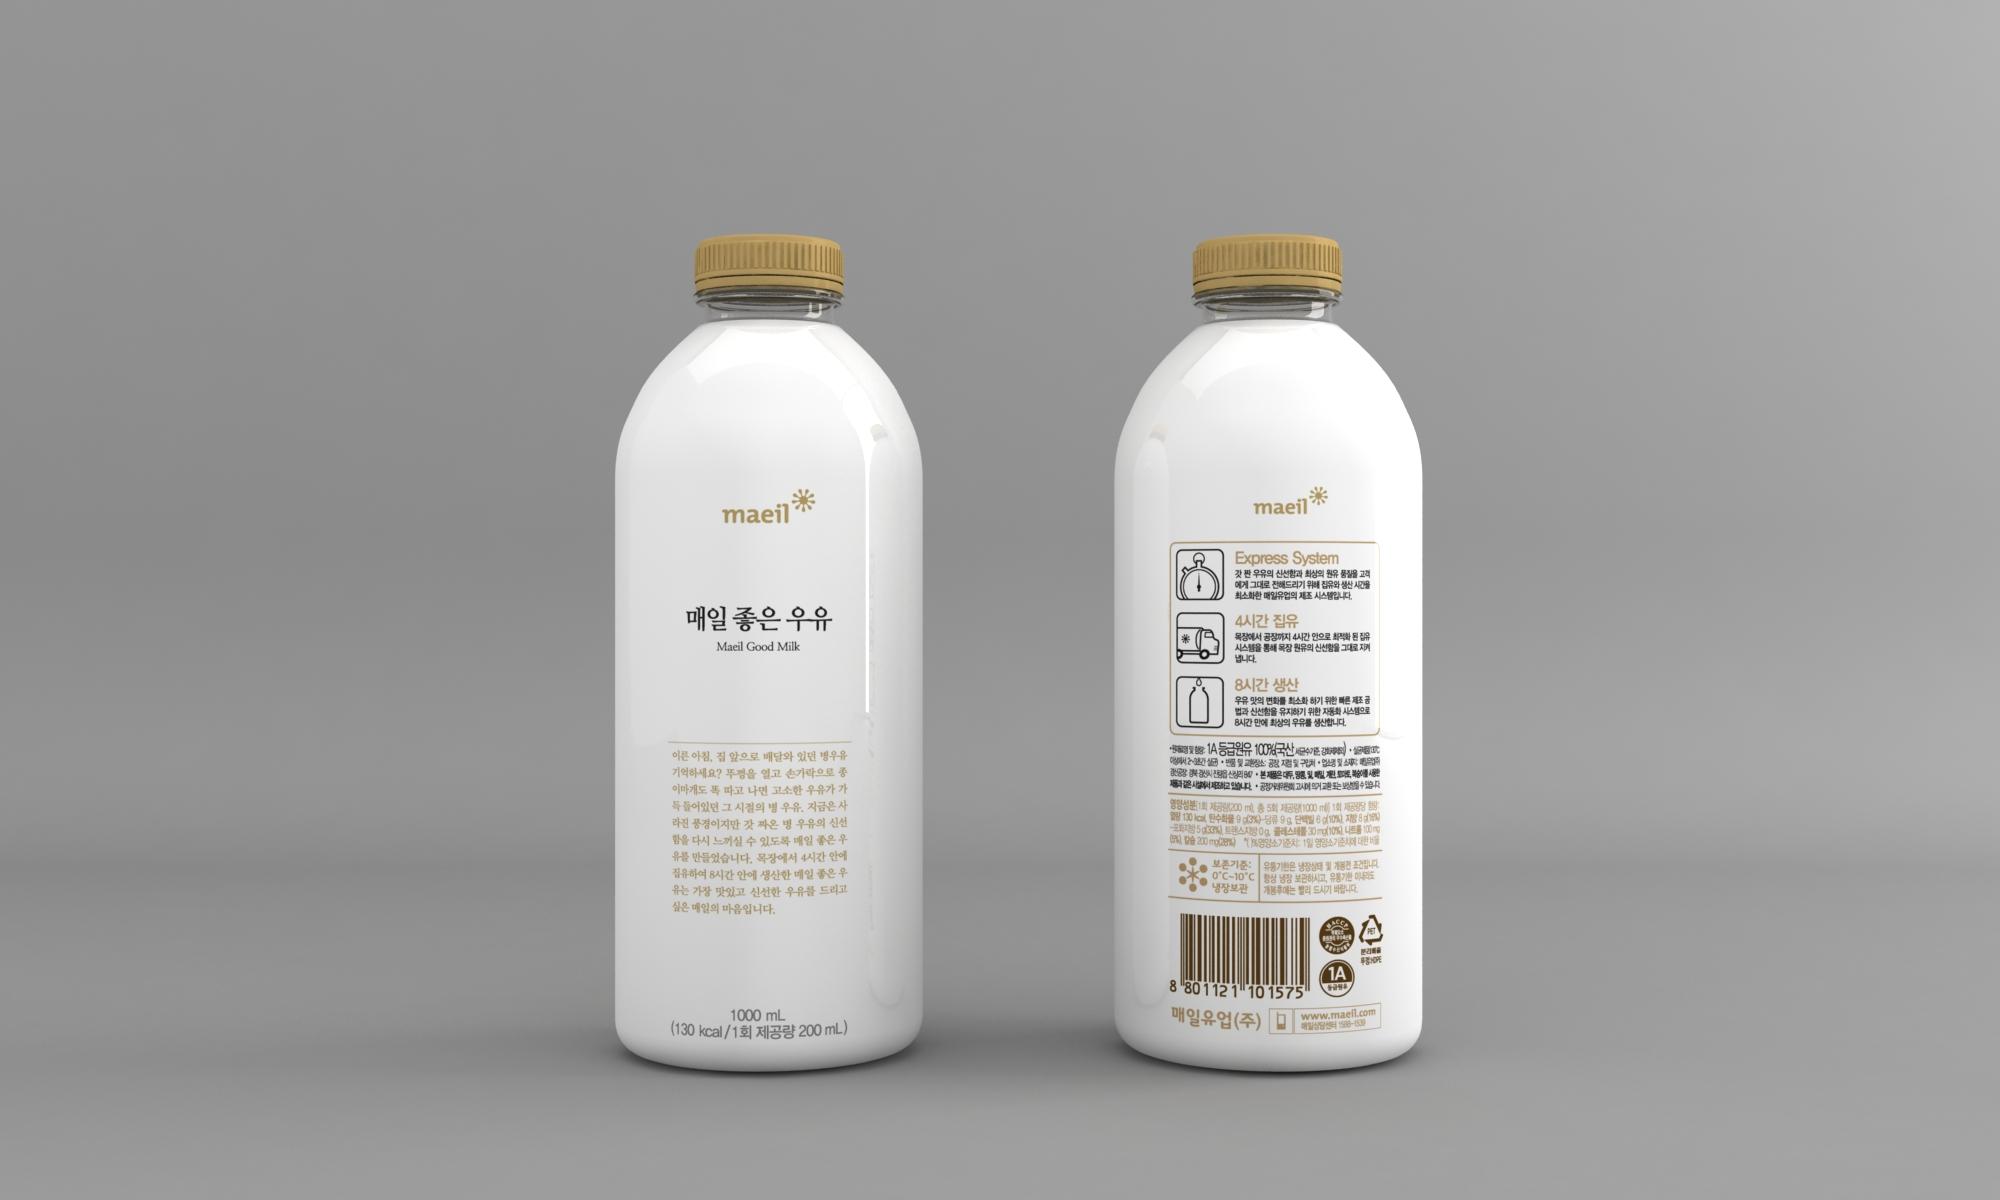 34-maeil-good-milk